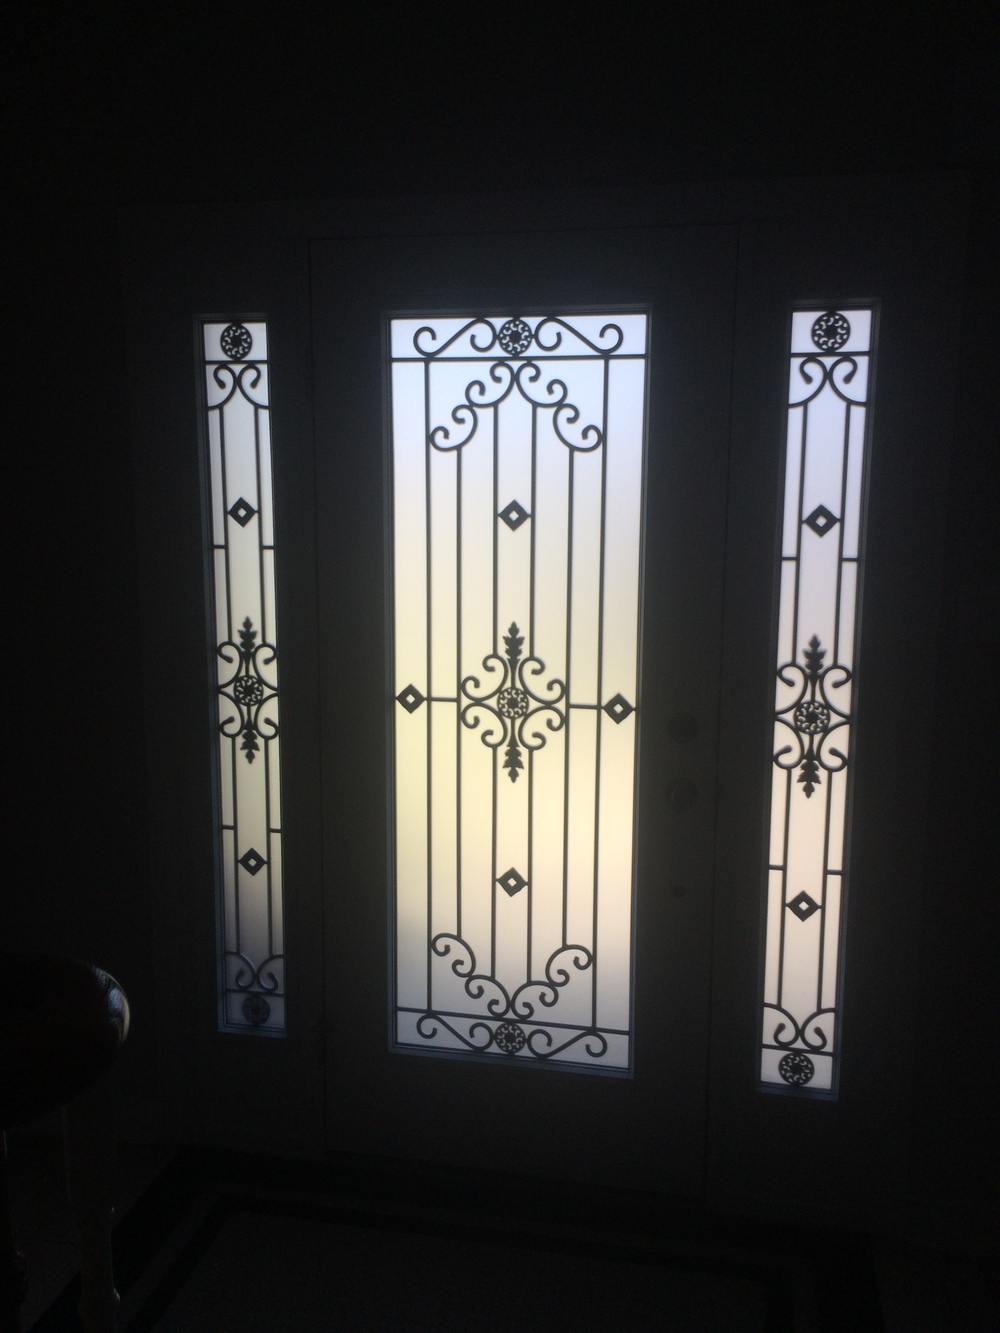 Dalmont-wrought-iron-glass-door-Inserts-Hamilton-Ontario